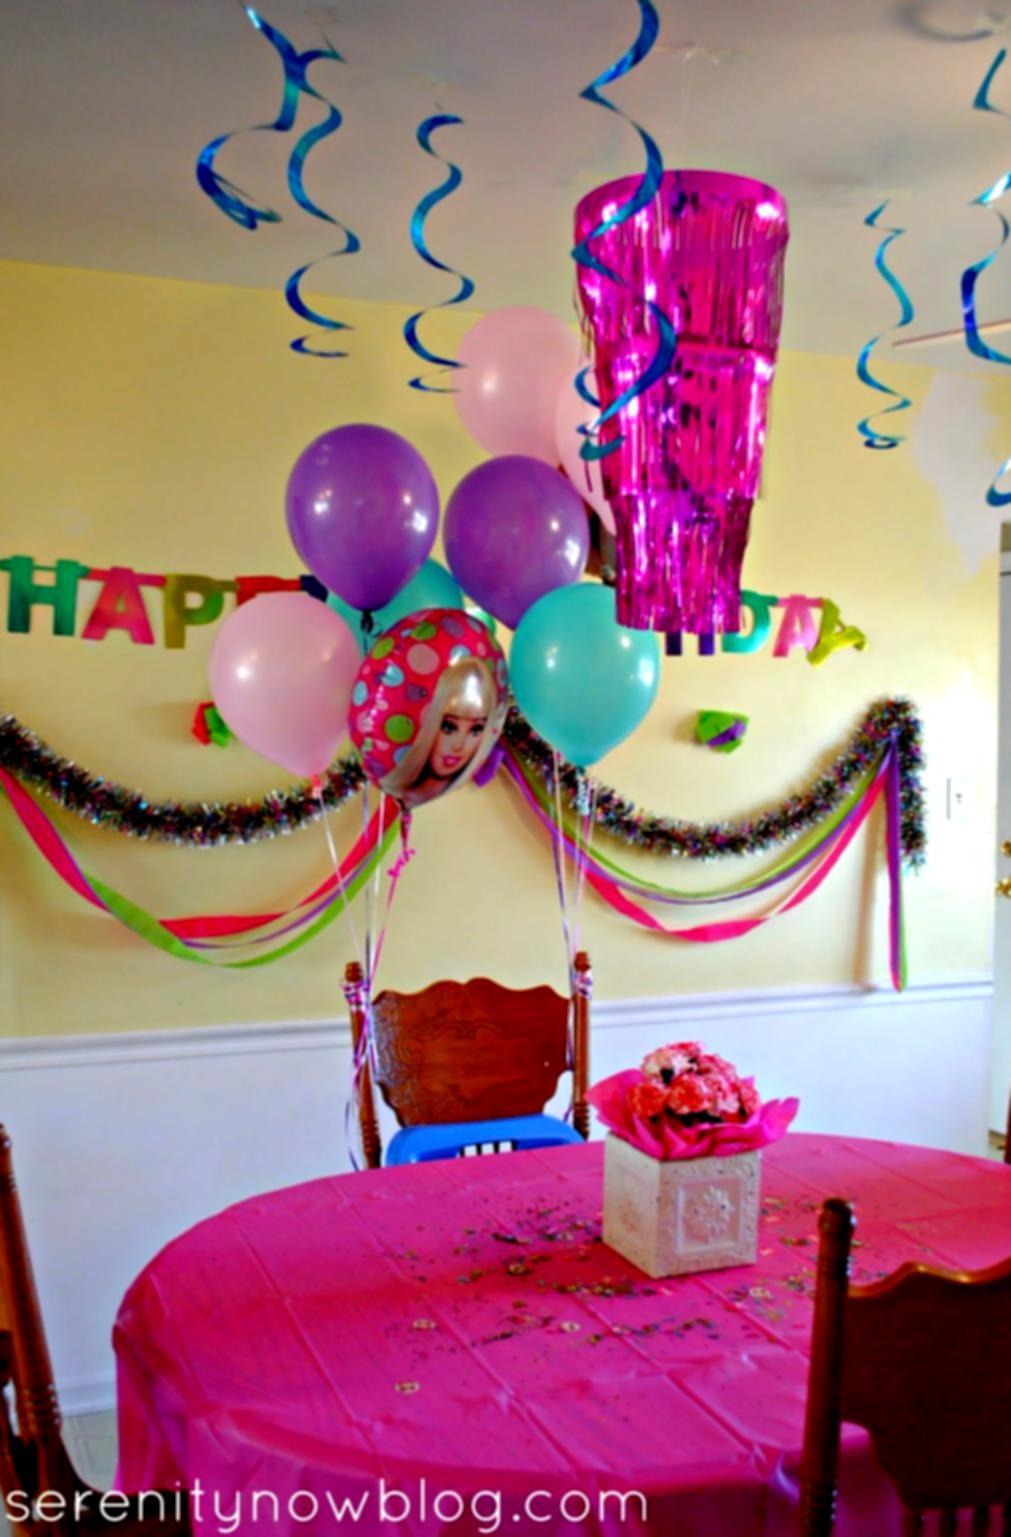 Birthday Decorations Ideas At Home  Birthday Party Decorations At Home Decoration Ideas For